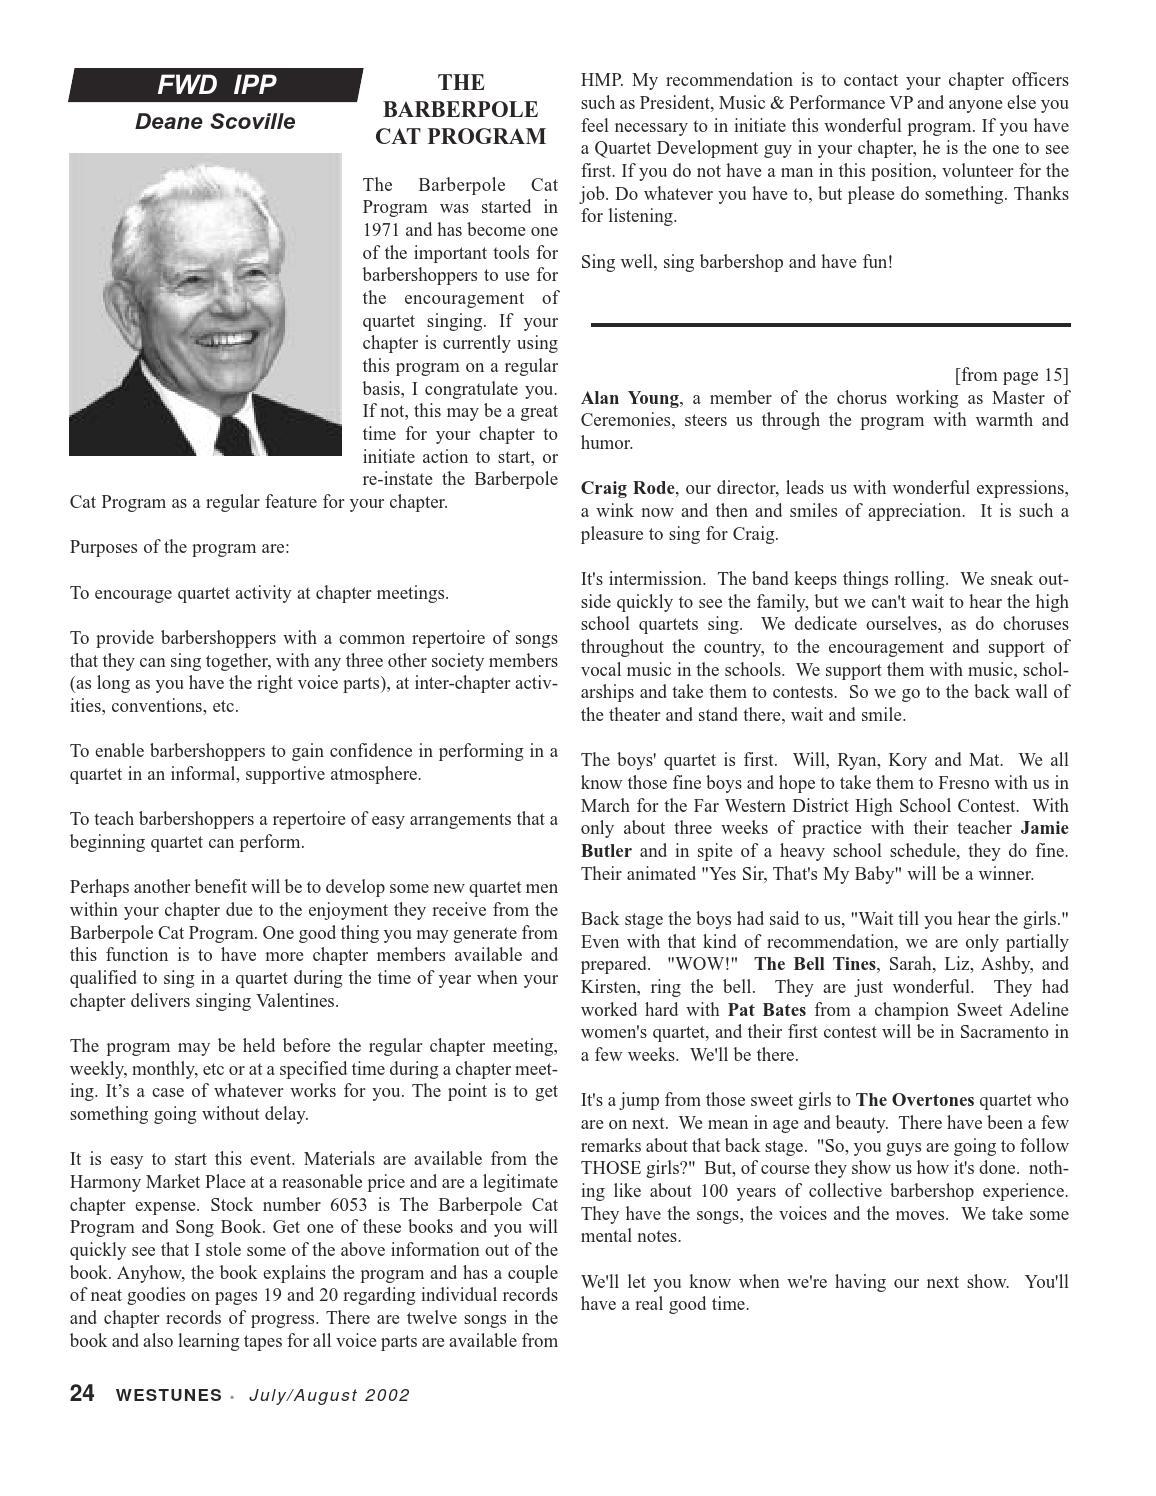 Westunes, Vol 52 No 4, Jul-Aug 2002 by Far Western District